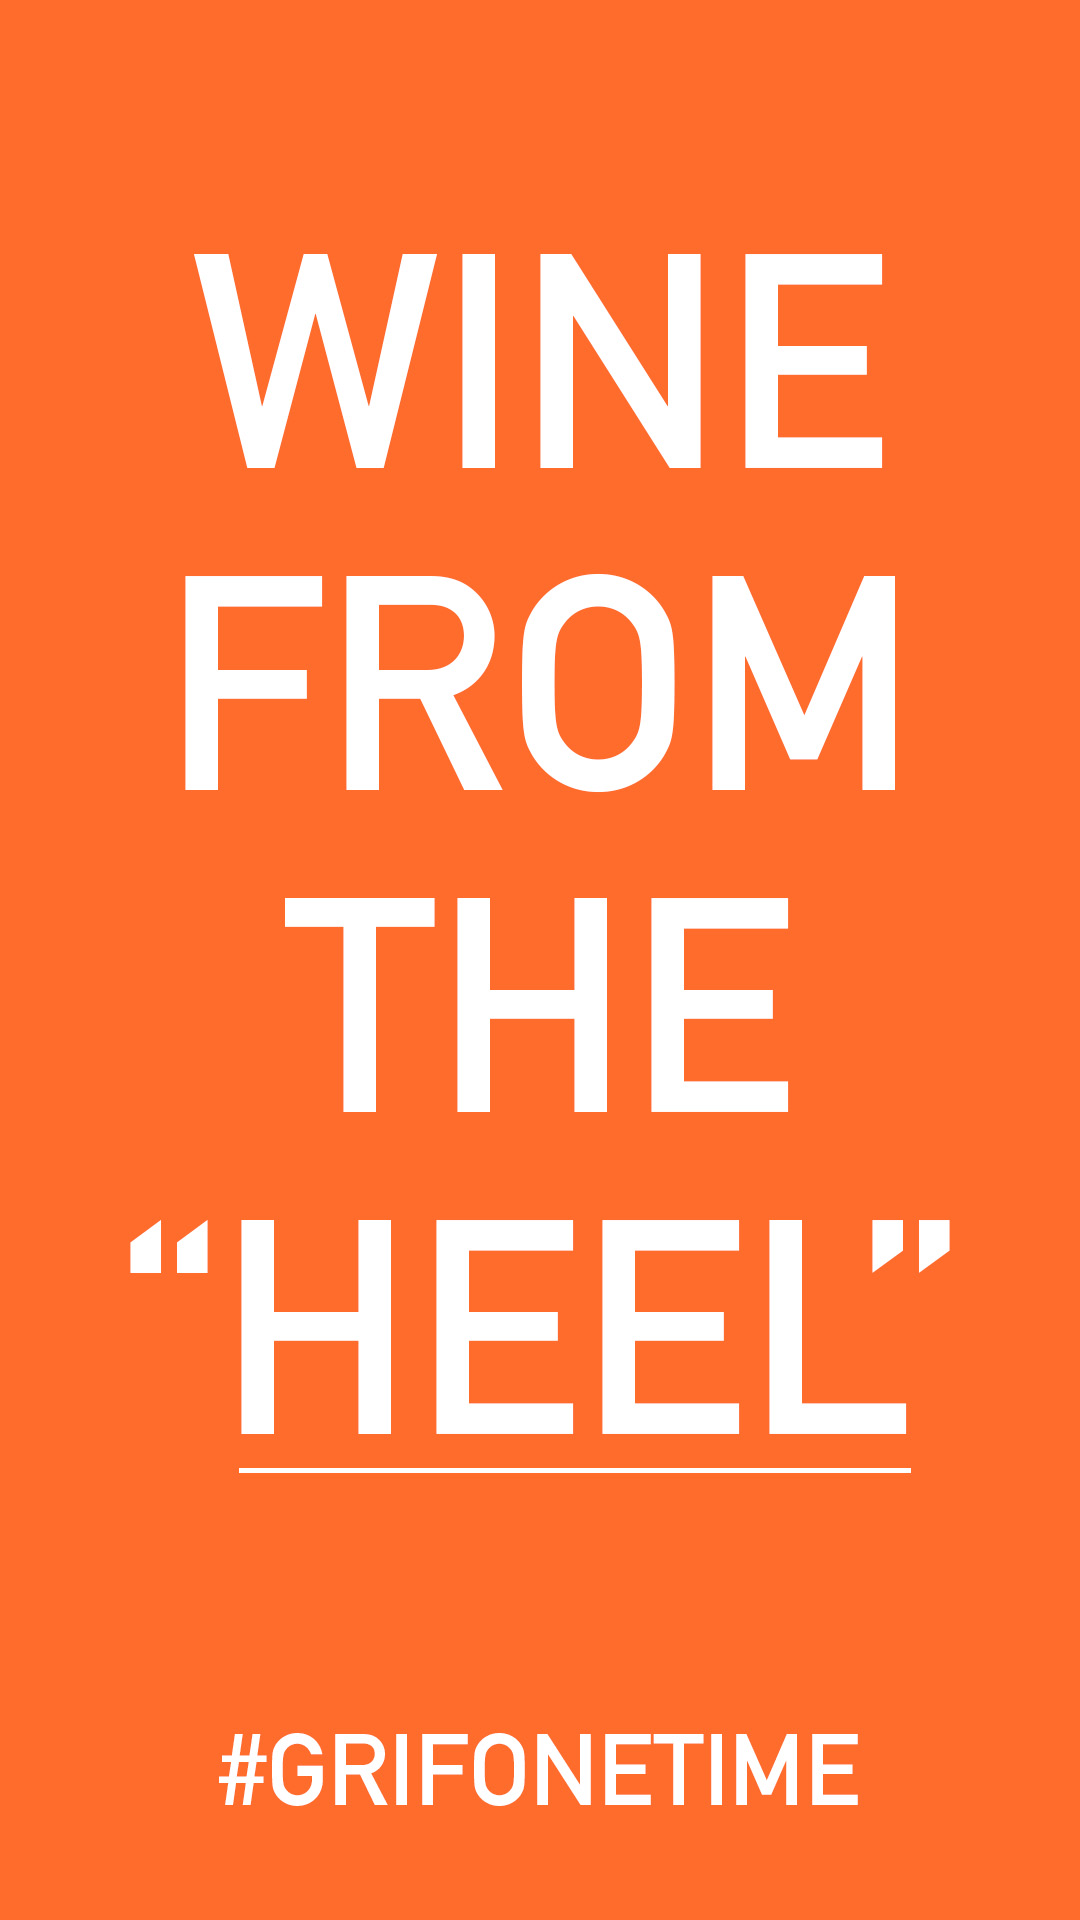 wine from the heel #grifonewine